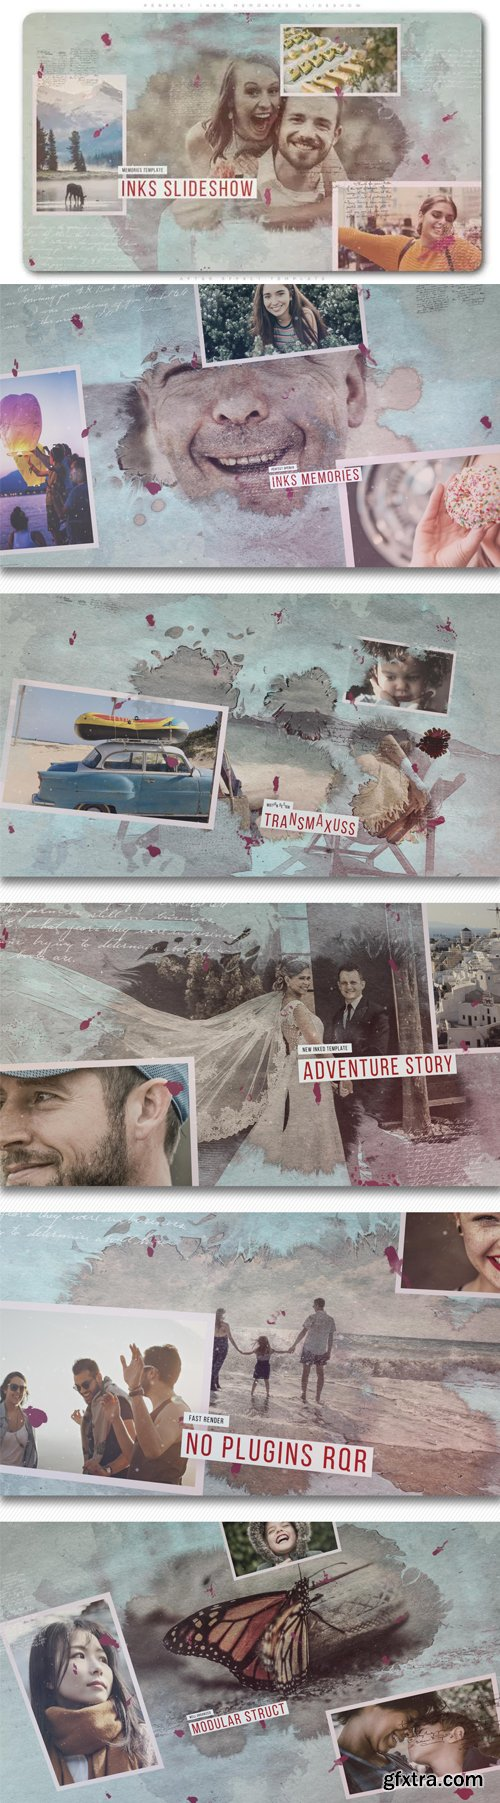 Videohive - Perfect Inks Memories Slideshow - 23051154